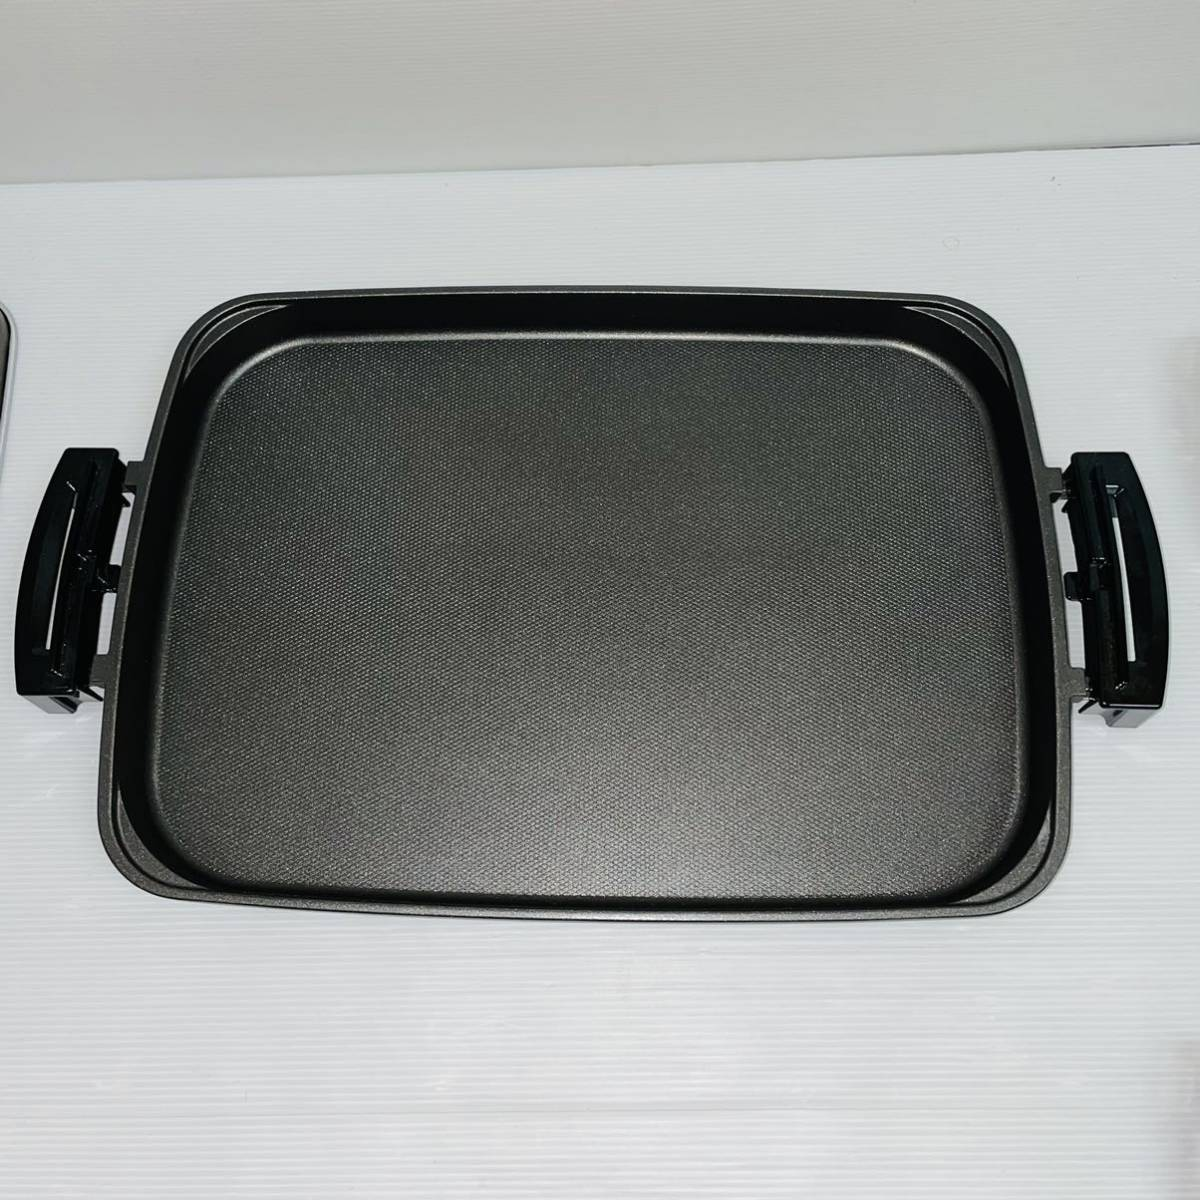 ZOJIRUSHI 象印 EA-EU30 ホットプレート 焼肉プレート たこ焼き タコパ ホットケーキ お好み焼き平面 _画像5